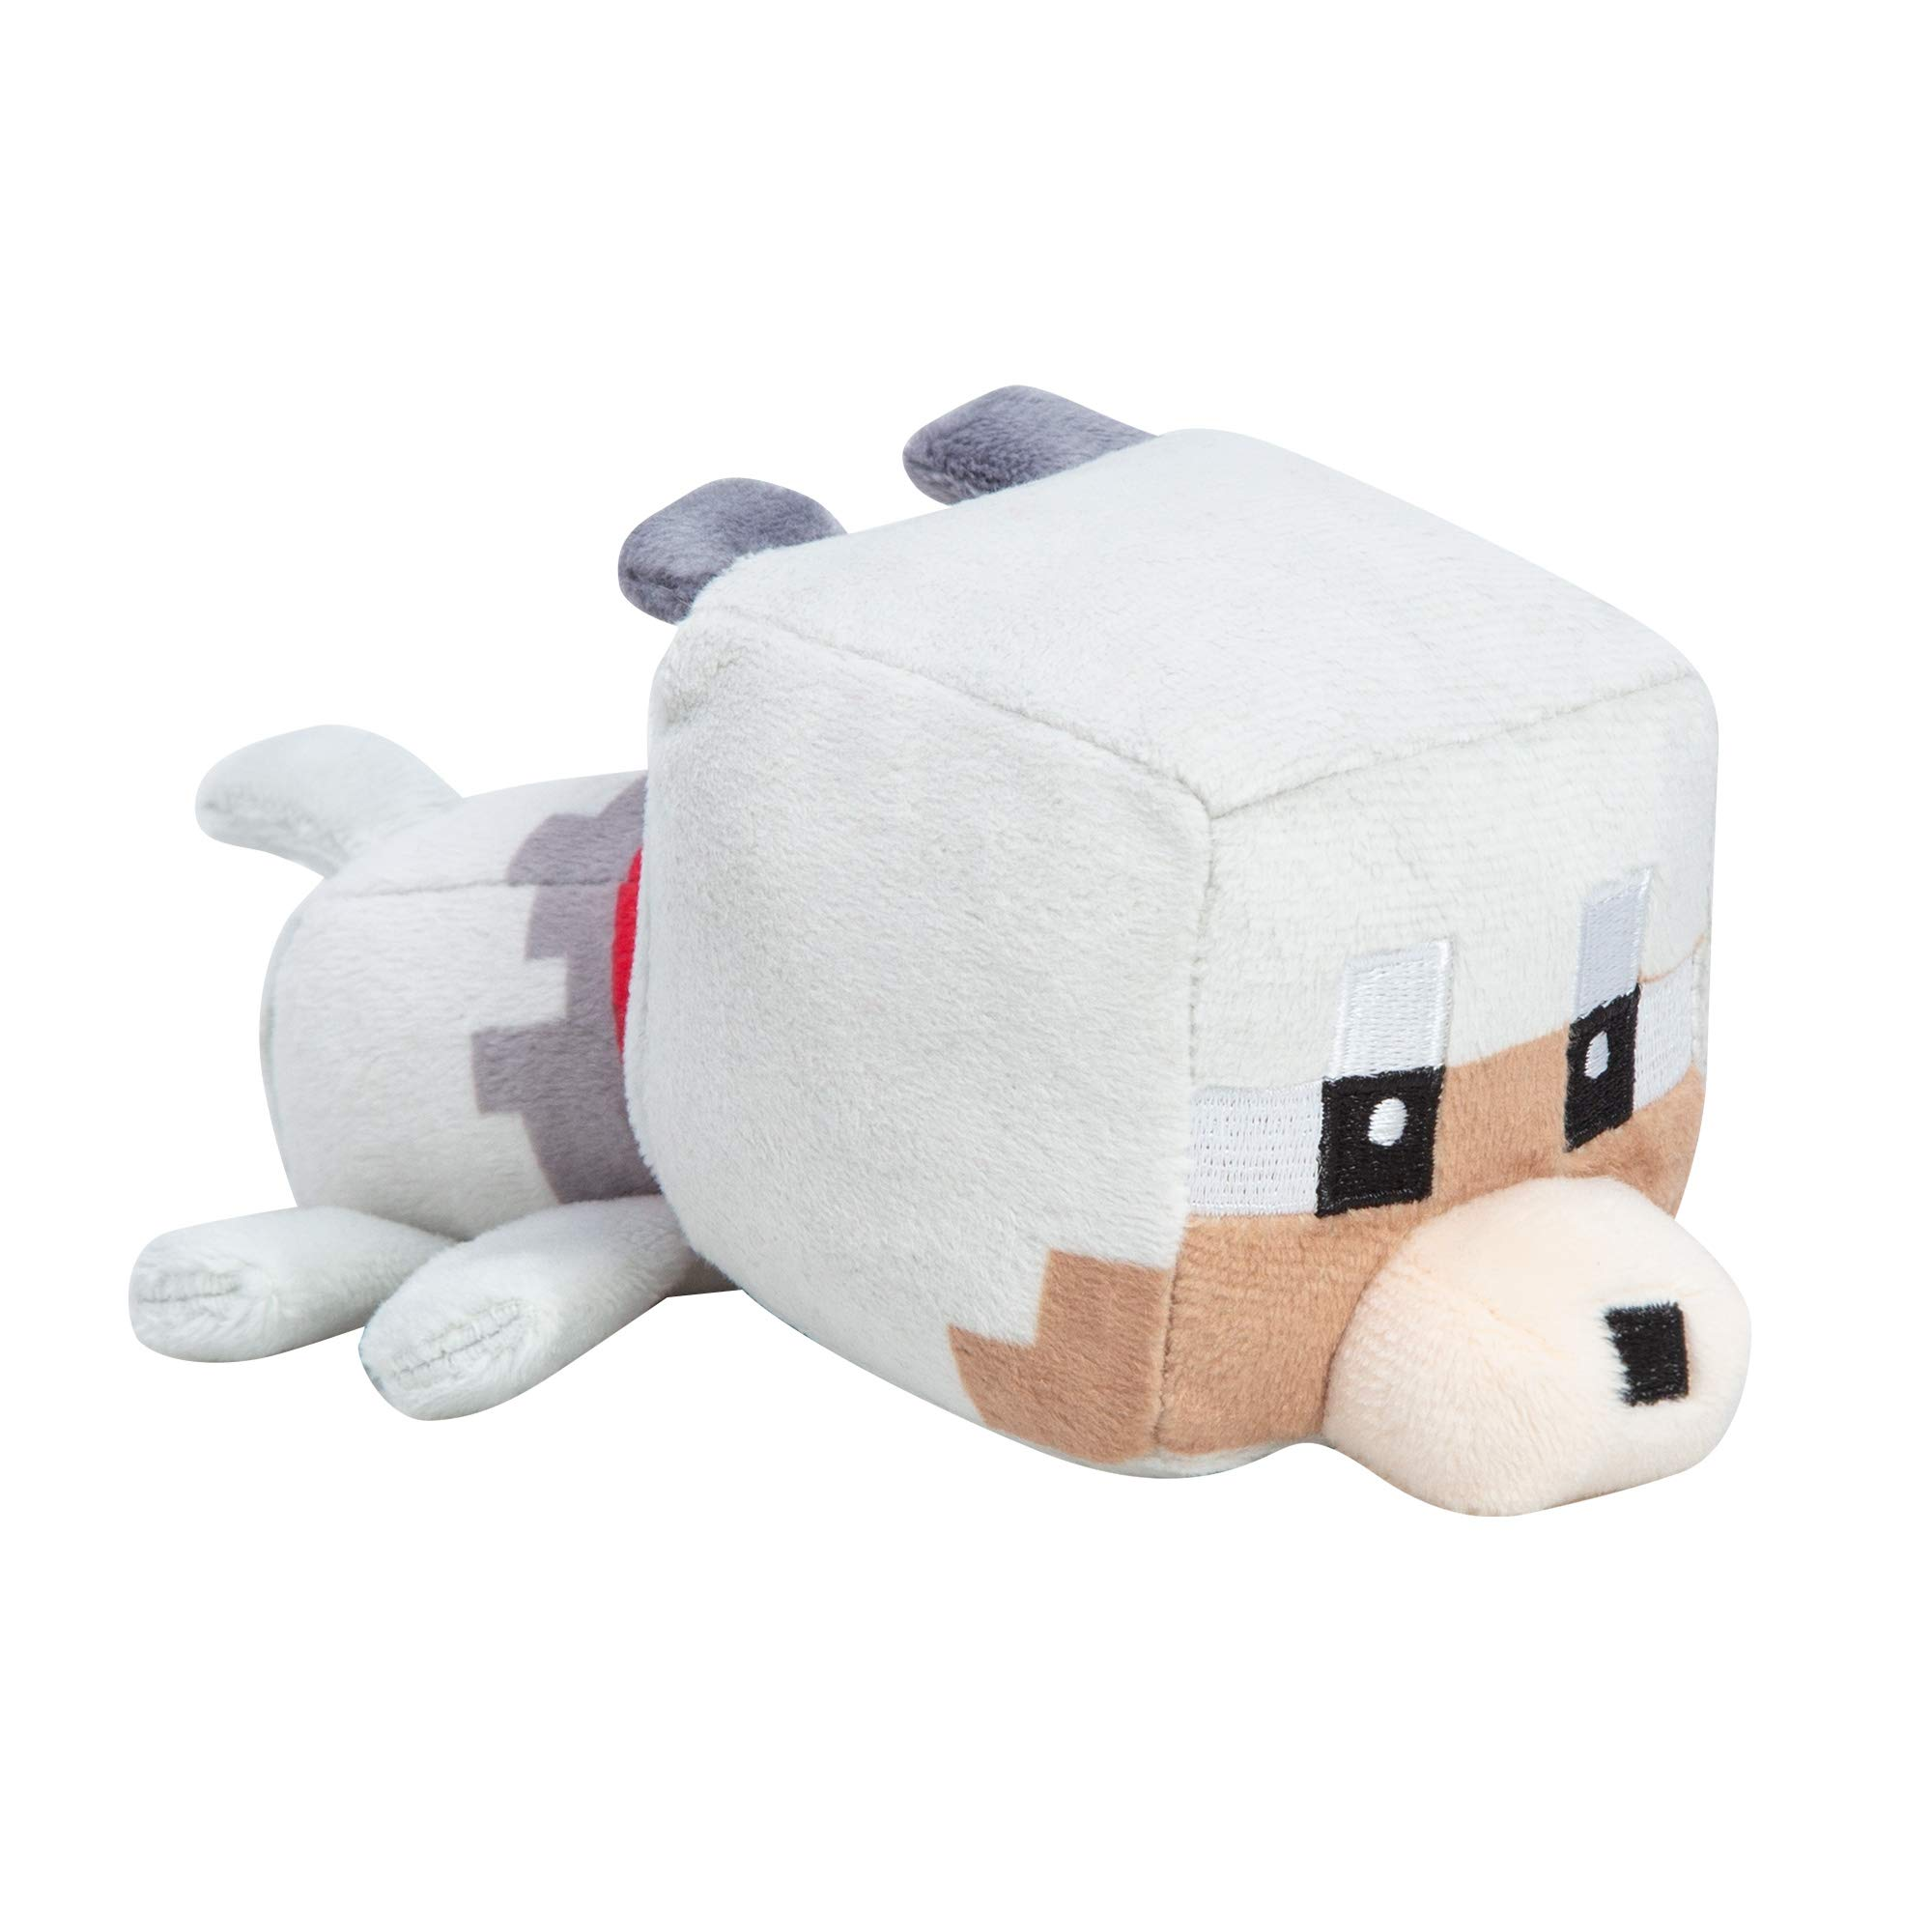 "JINX Minecraft Mini Crafter Tamed Wolf Plush Stuffed Toy, Gray, 8"" Long"